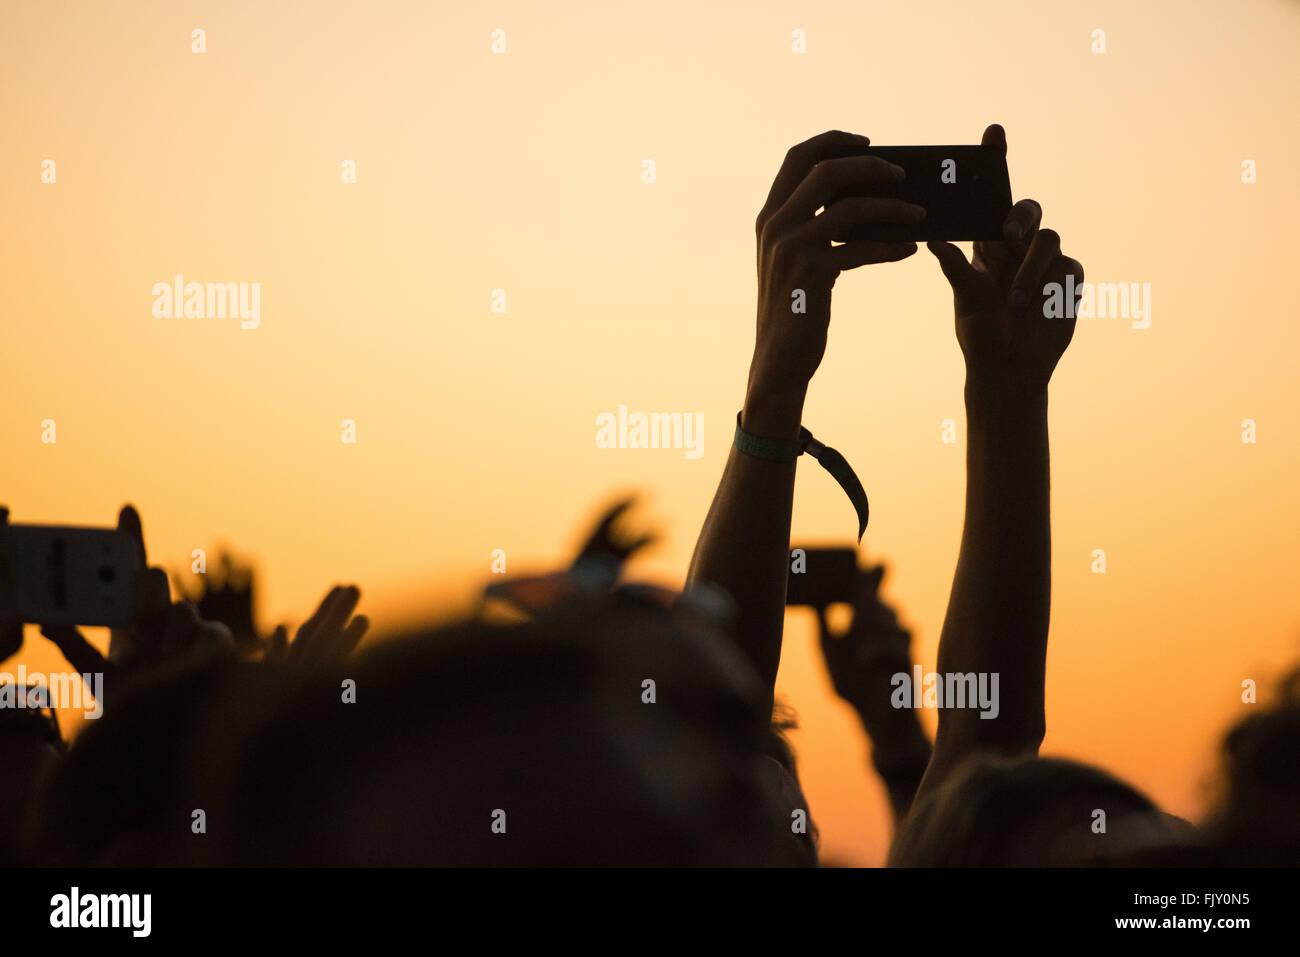 Manos recortadas fotografiar a través de teléfonos inteligentes durante el Festival de Música Imagen De Stock